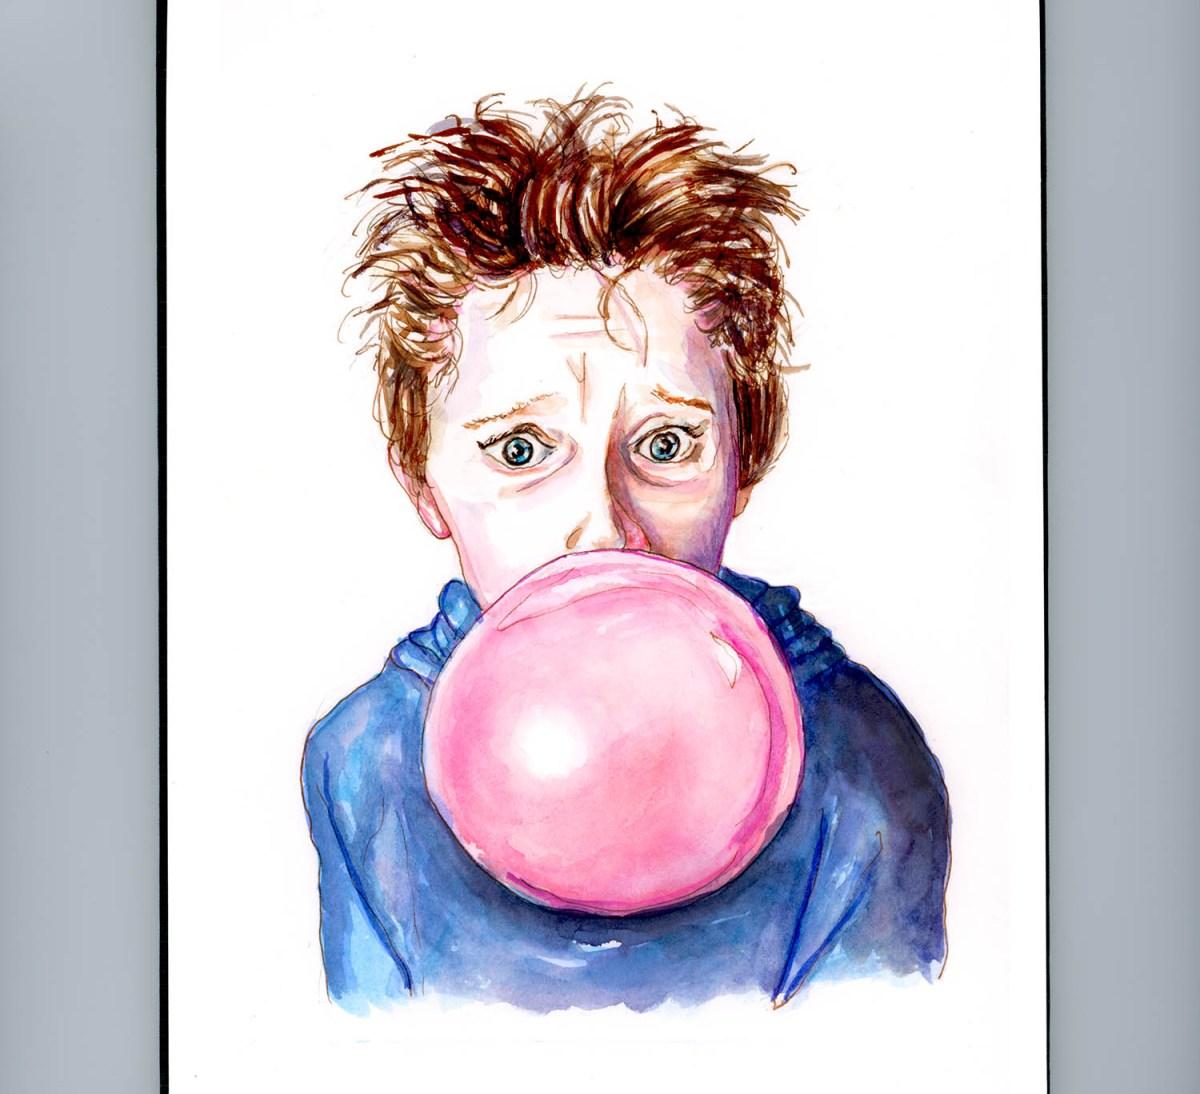 Day 7 - Waiting For The Bubble To Pop Boy Blowing Bubbles - #doodlewashApril2018 Doodlewash